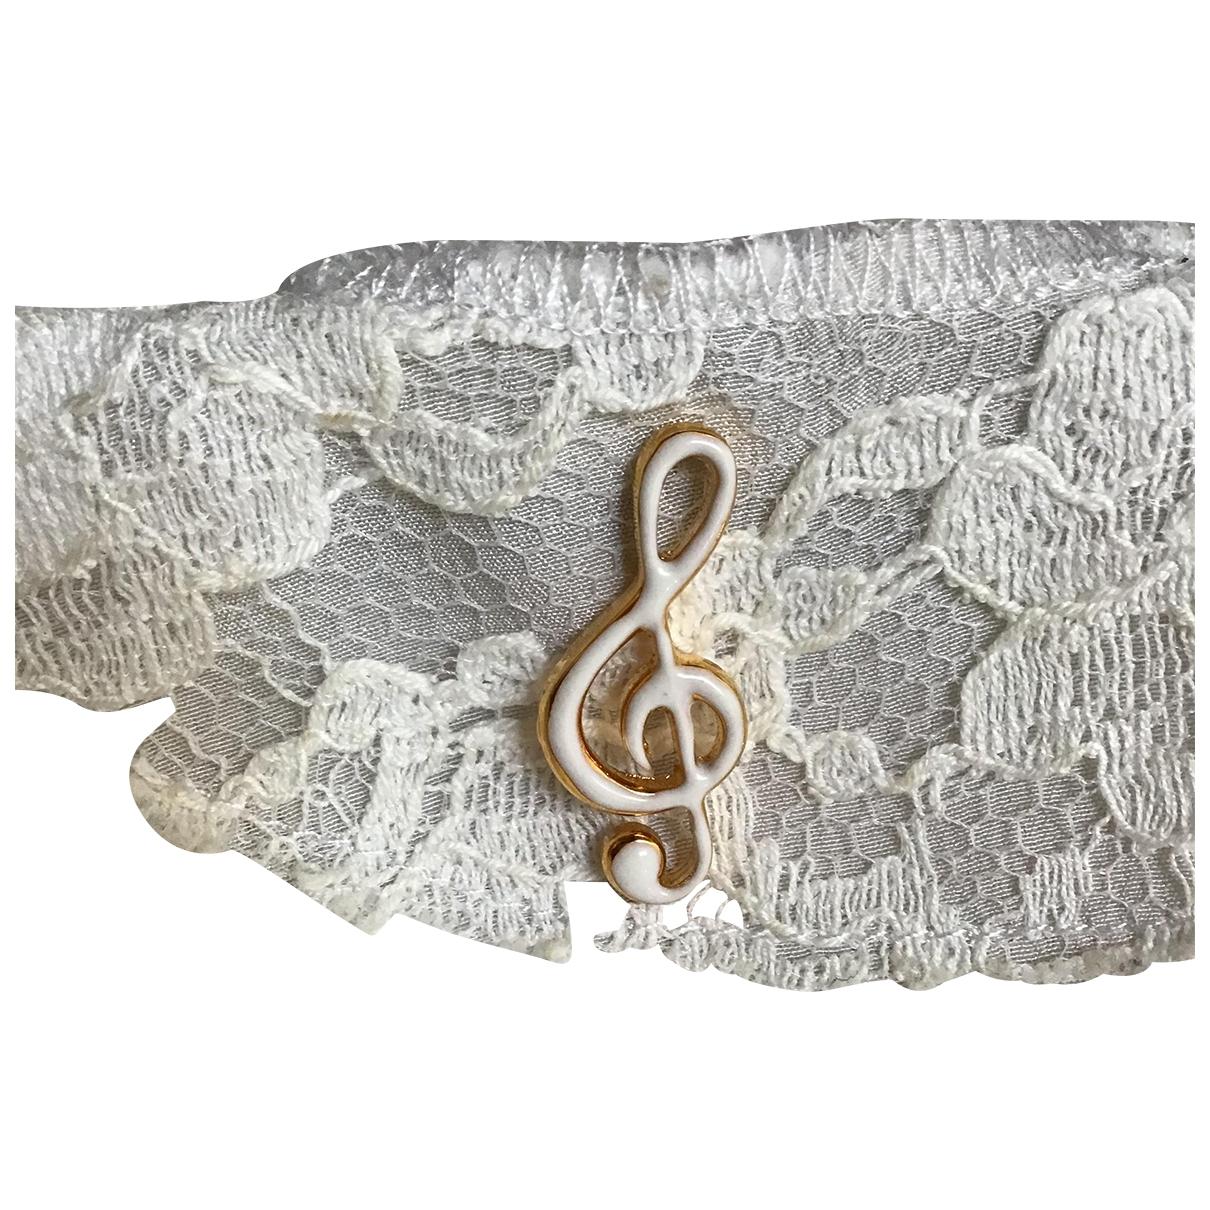 Dolce & Gabbana \N Brosche in  Weiss Metall